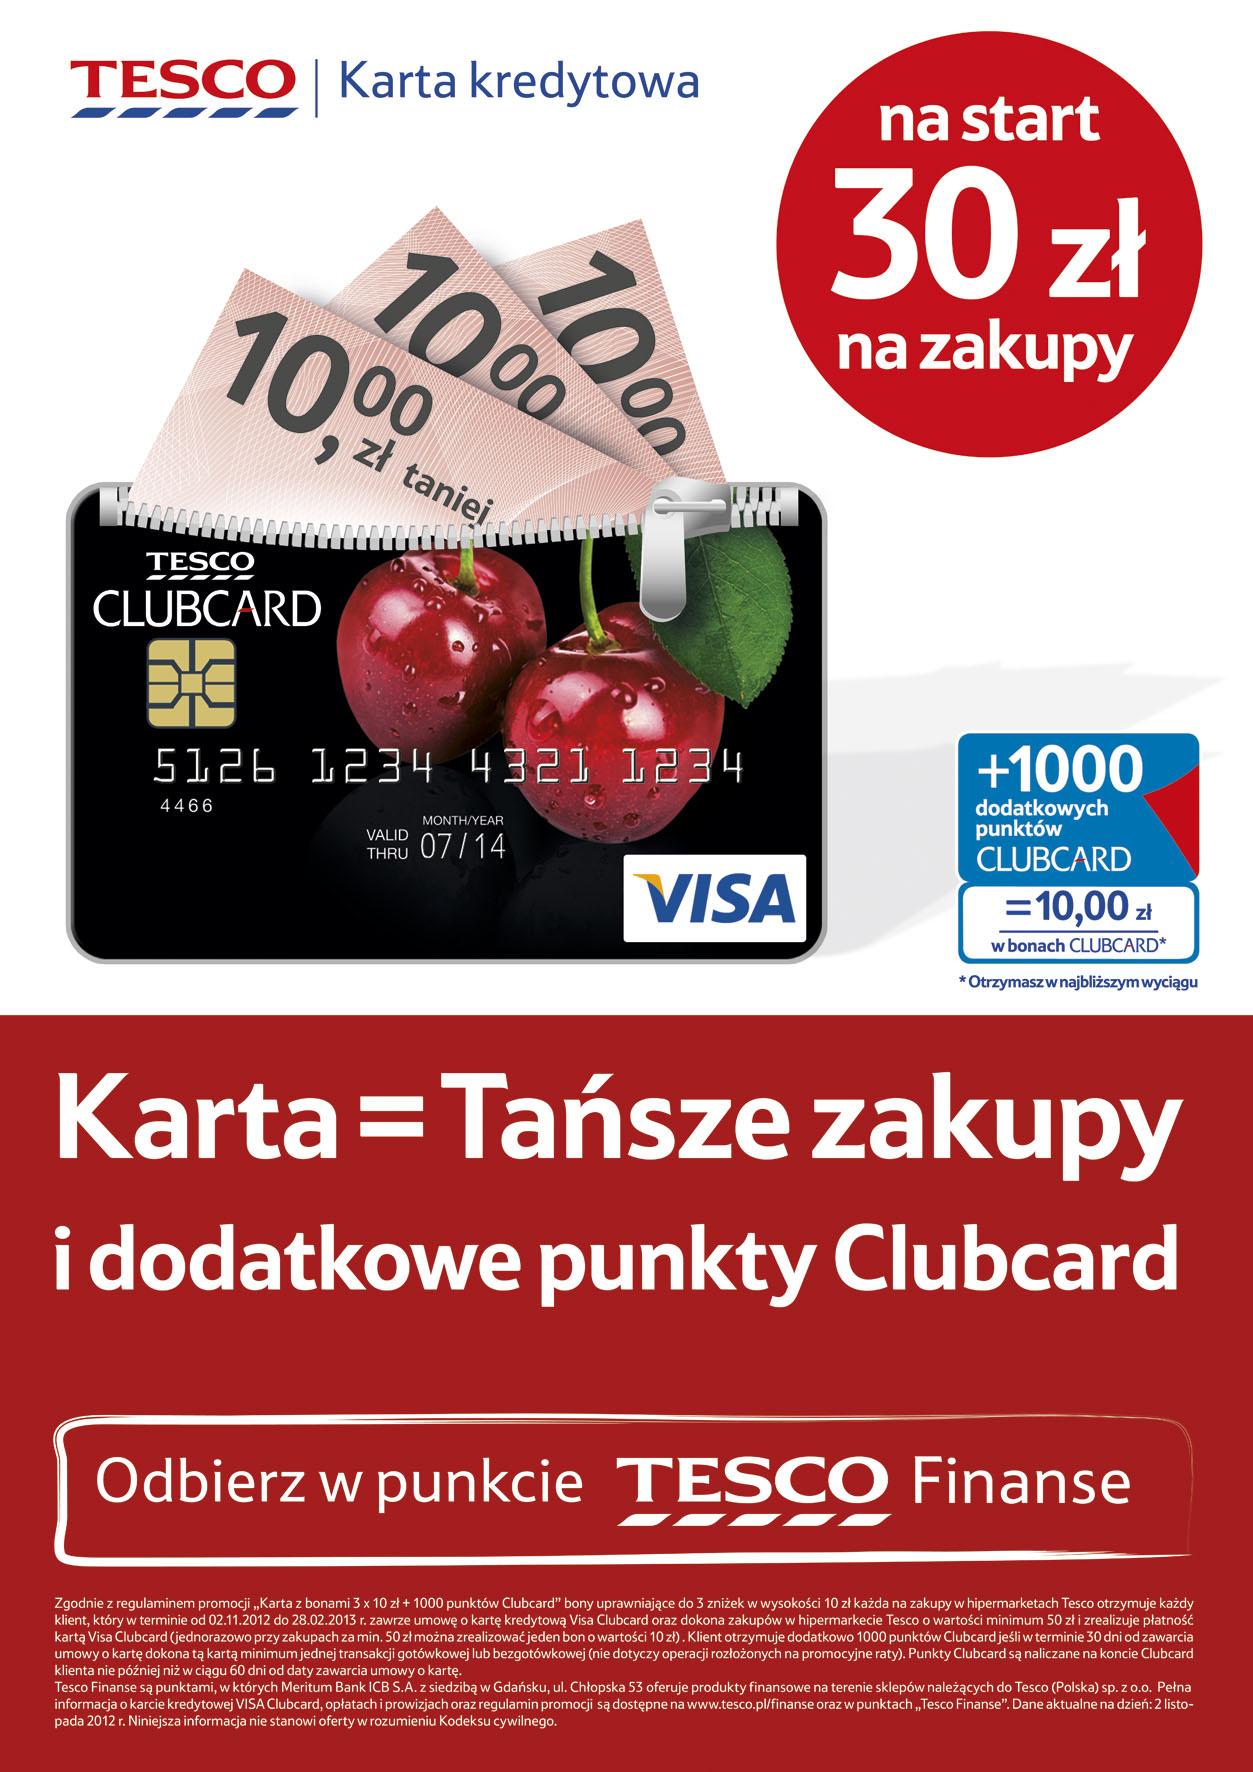 Tesco Finanse / Copywriting Agata Stachowska / Realizacja AR CzART